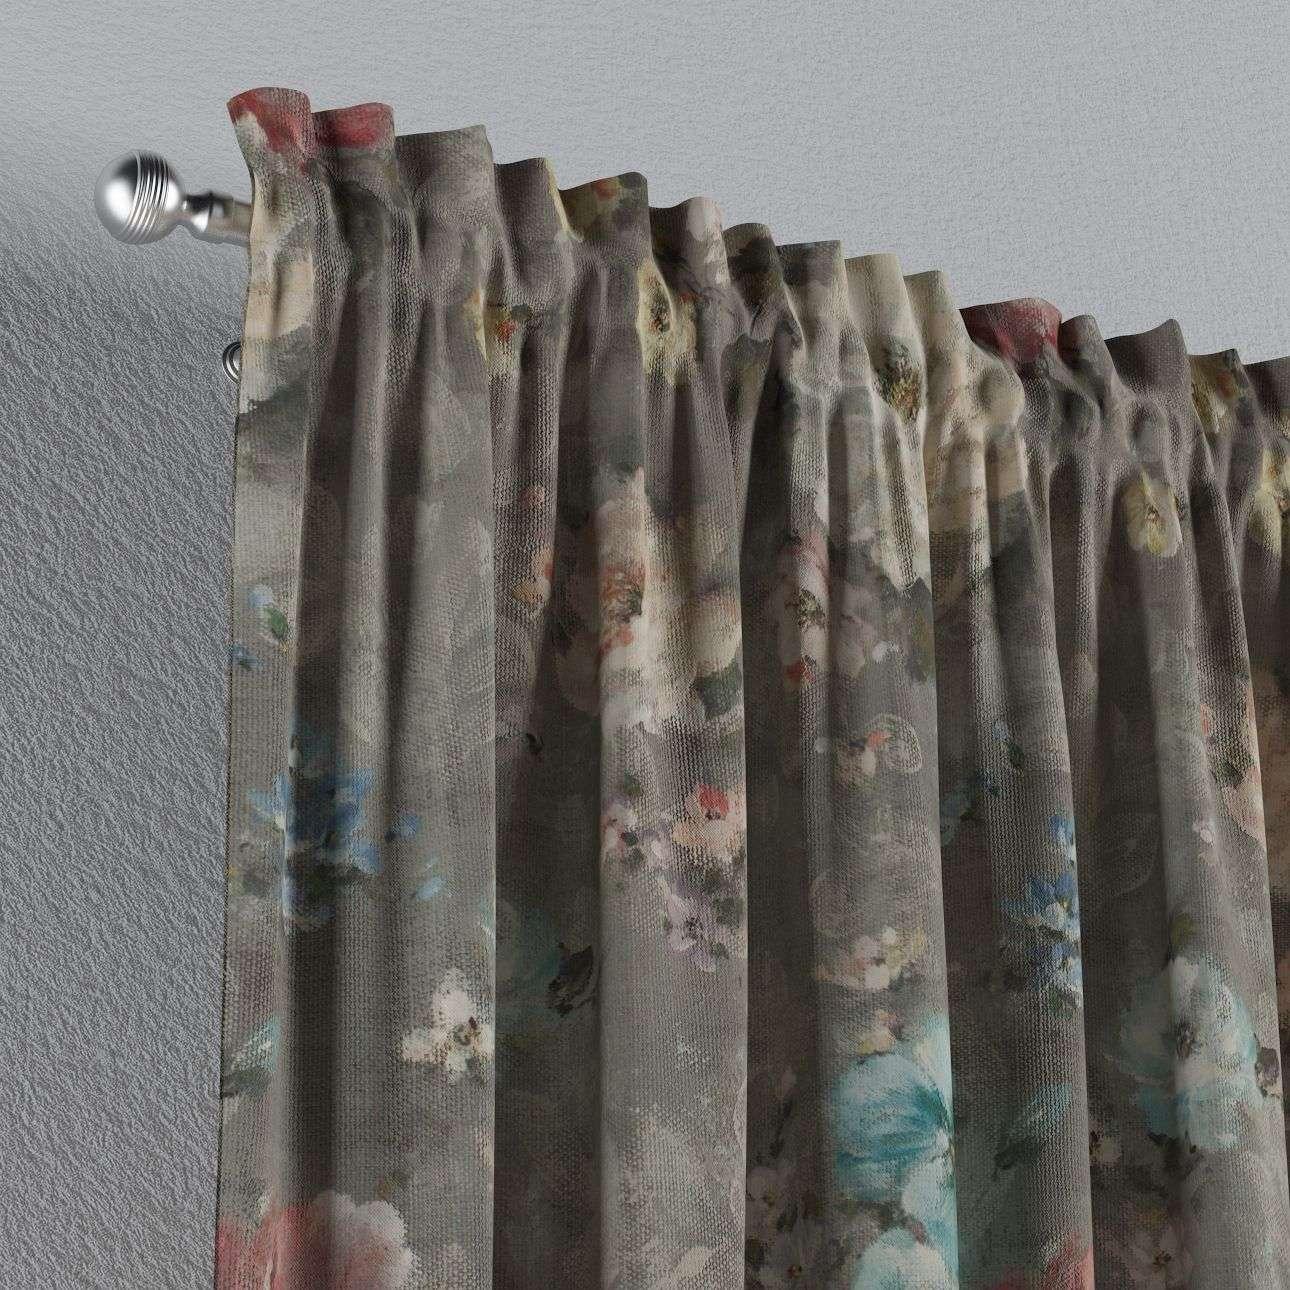 Závěs s tunýlkem a volánkem  v kolekci Monet, látka: 137-81